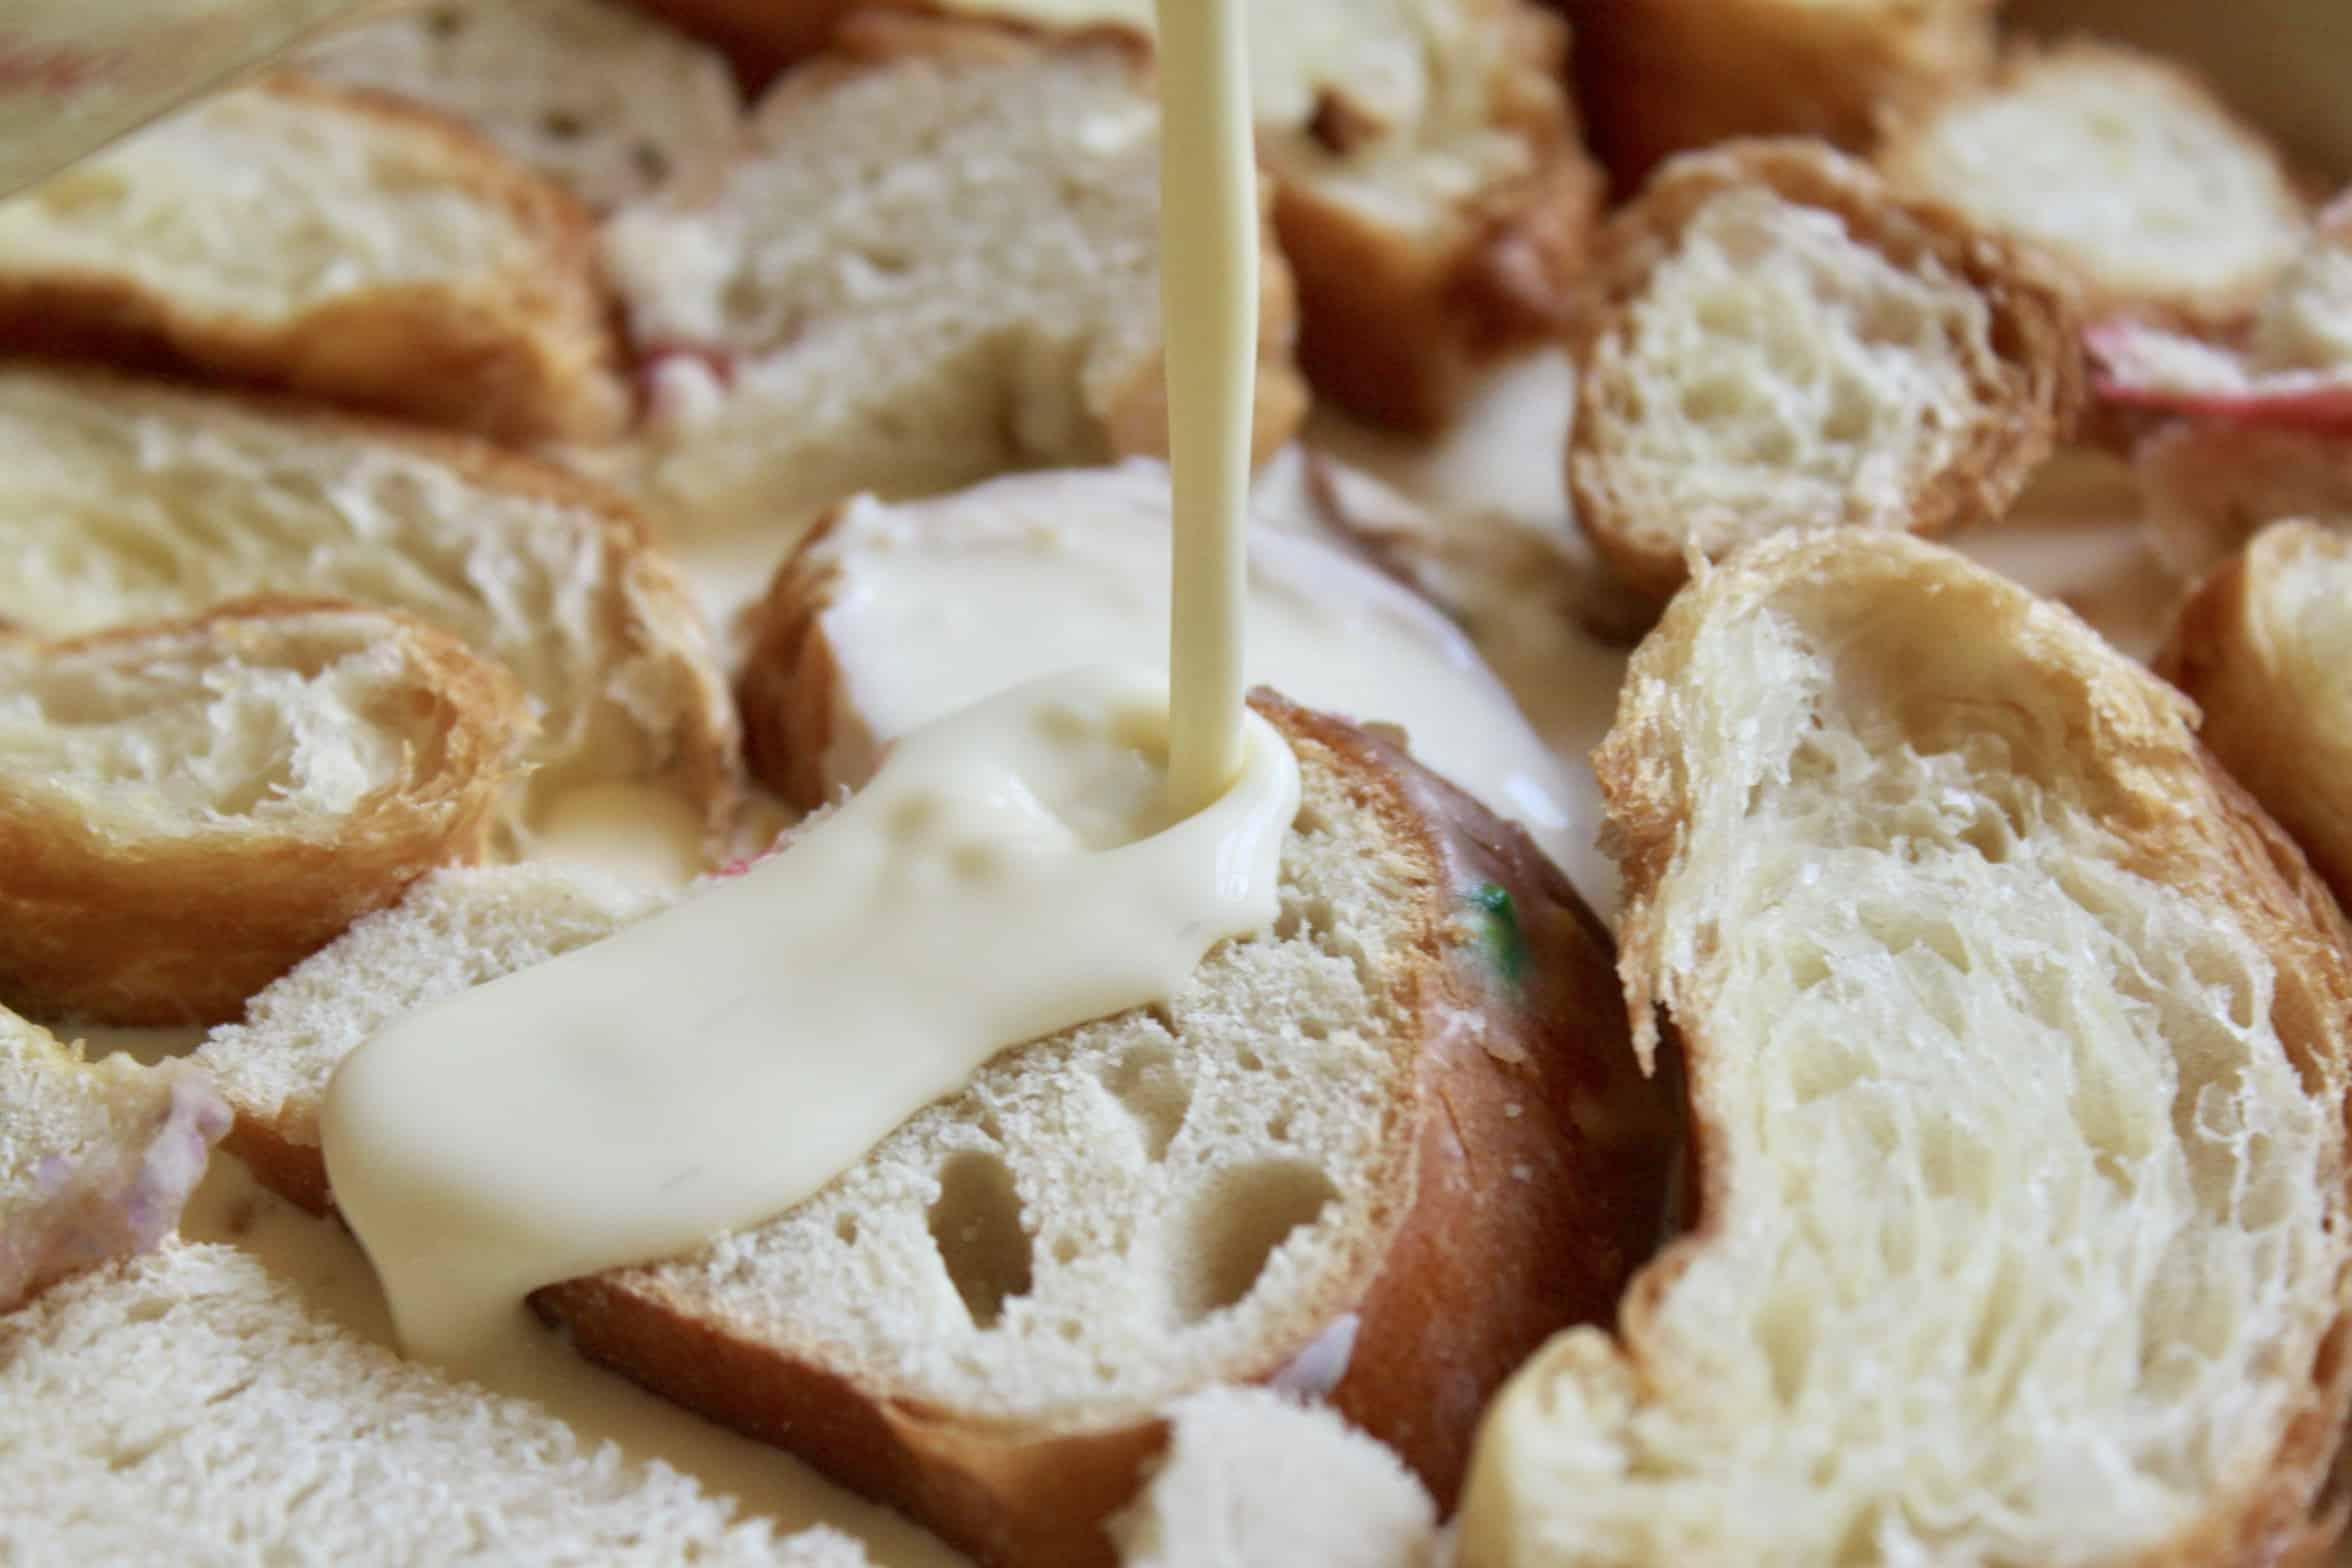 pouring custard over bread